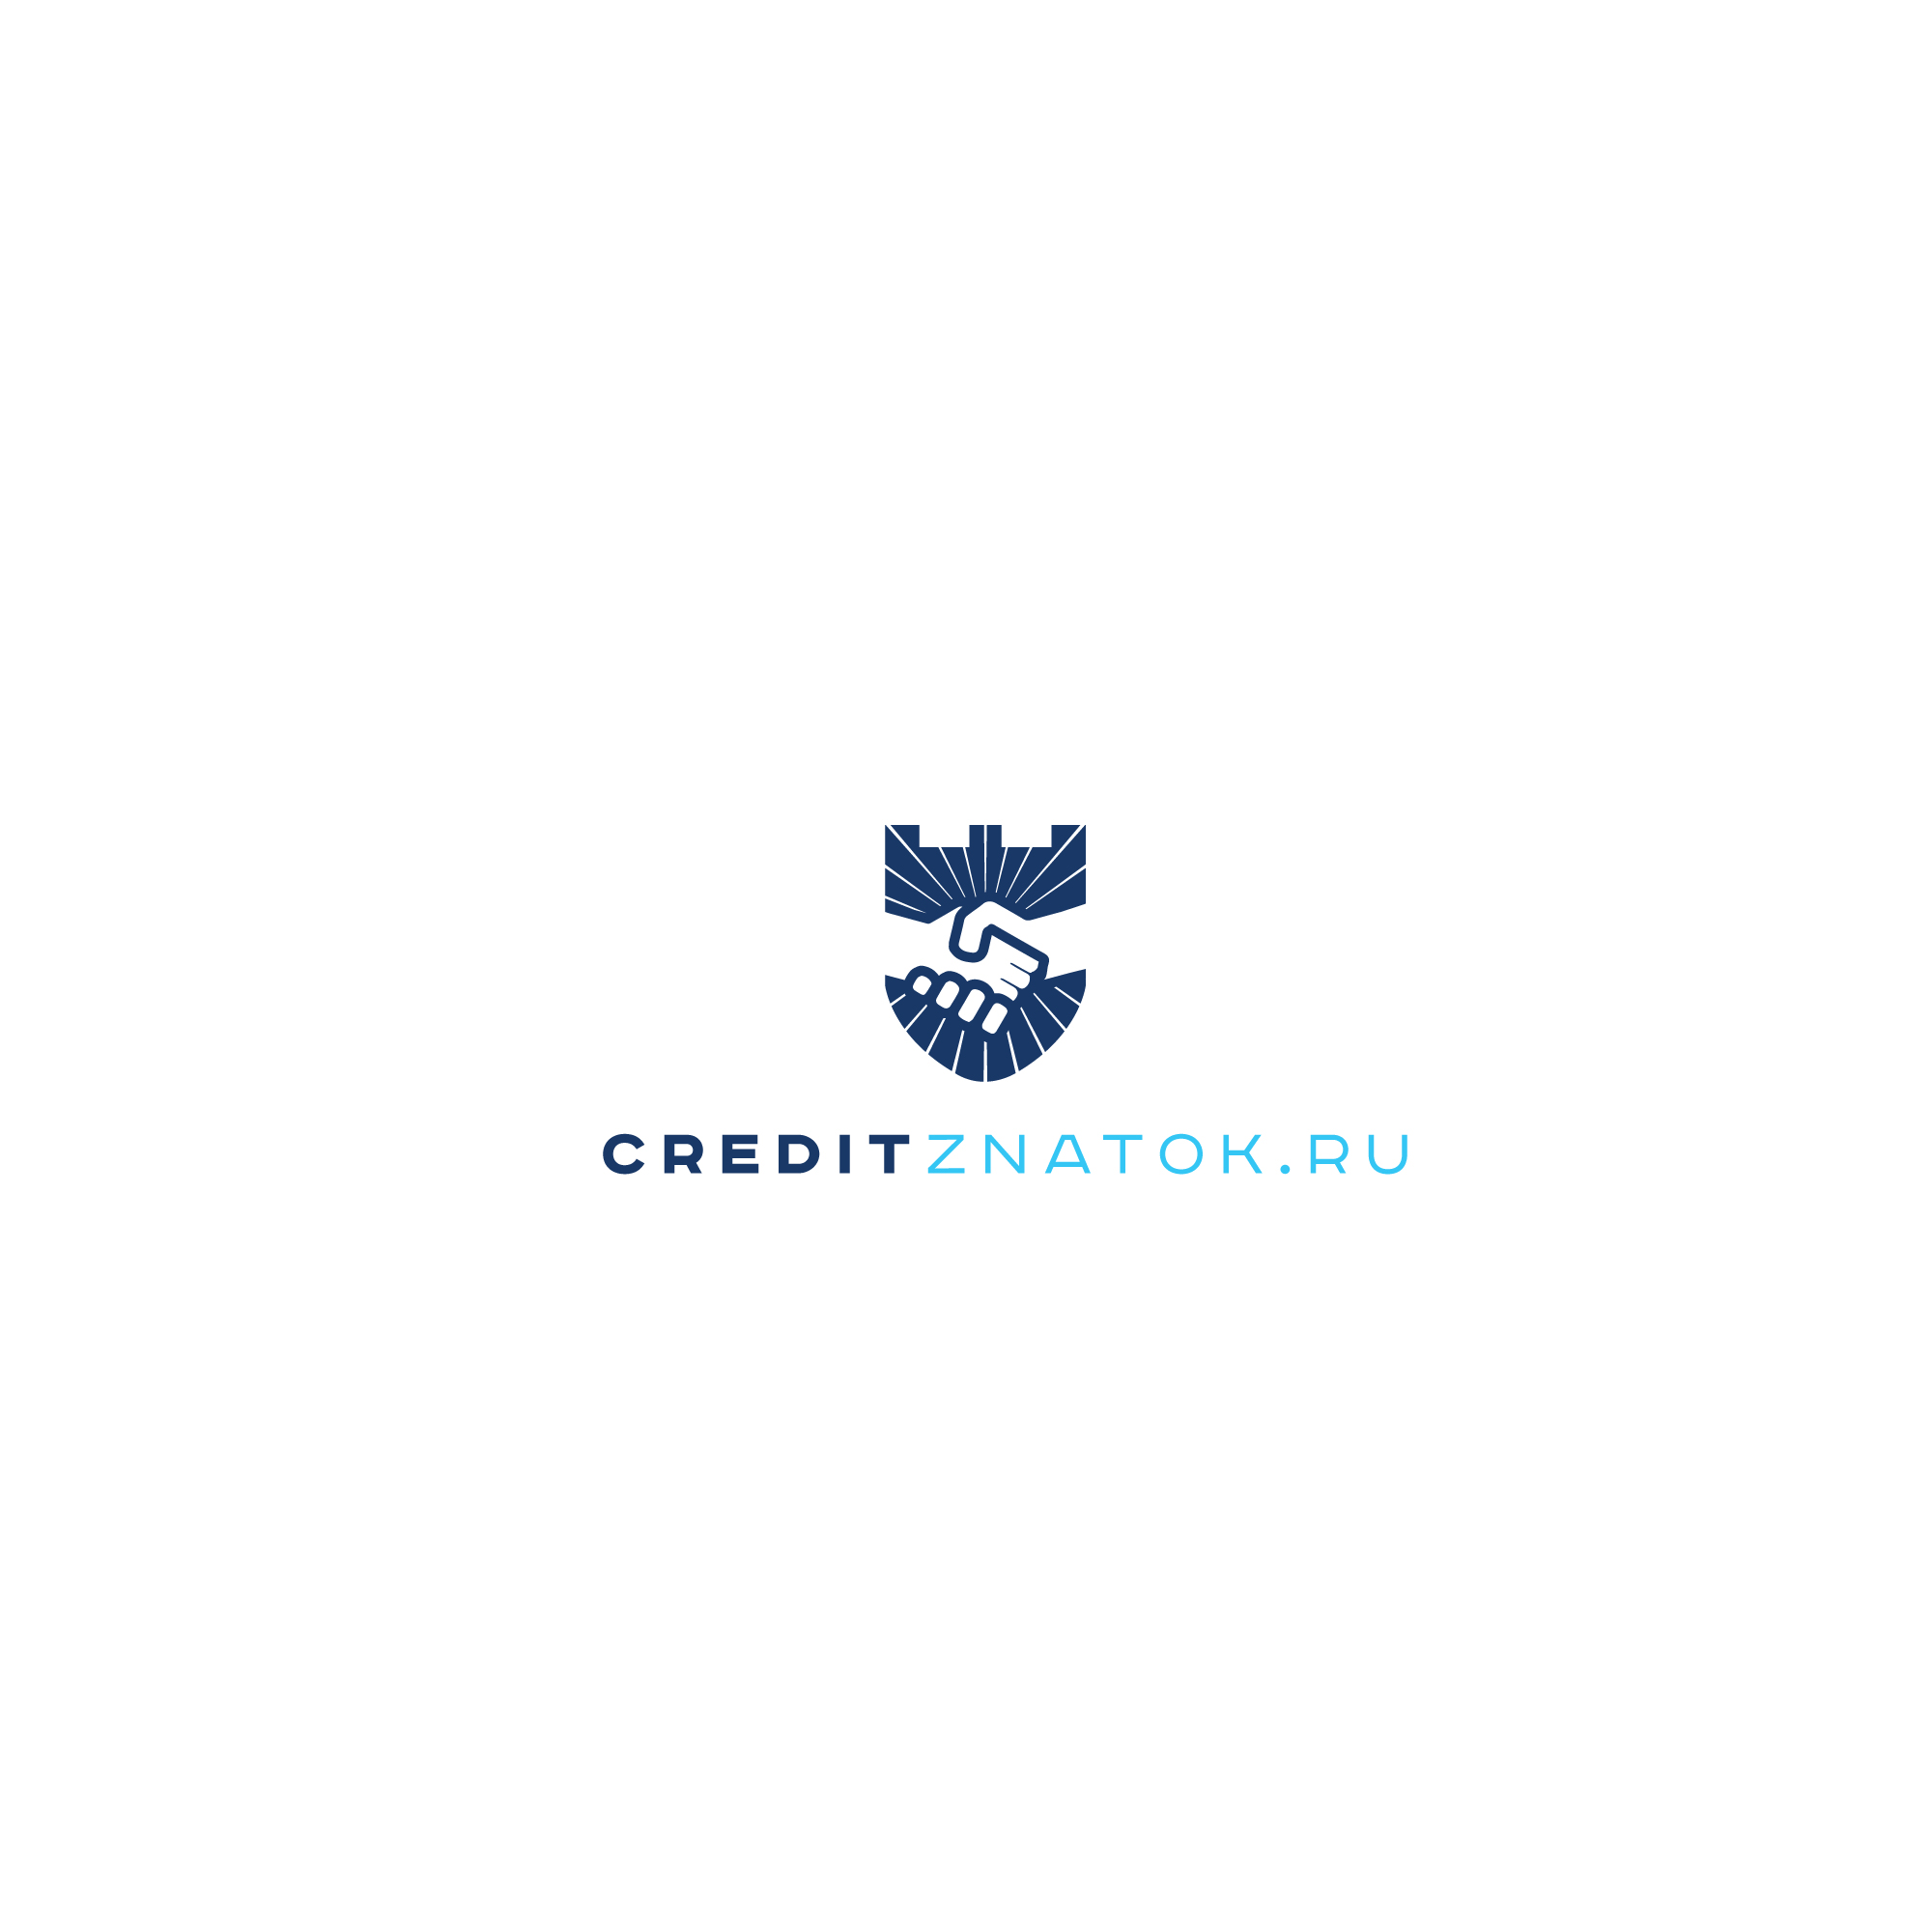 creditznatok.ru - логотип фото f_348589878e5e731c.jpg